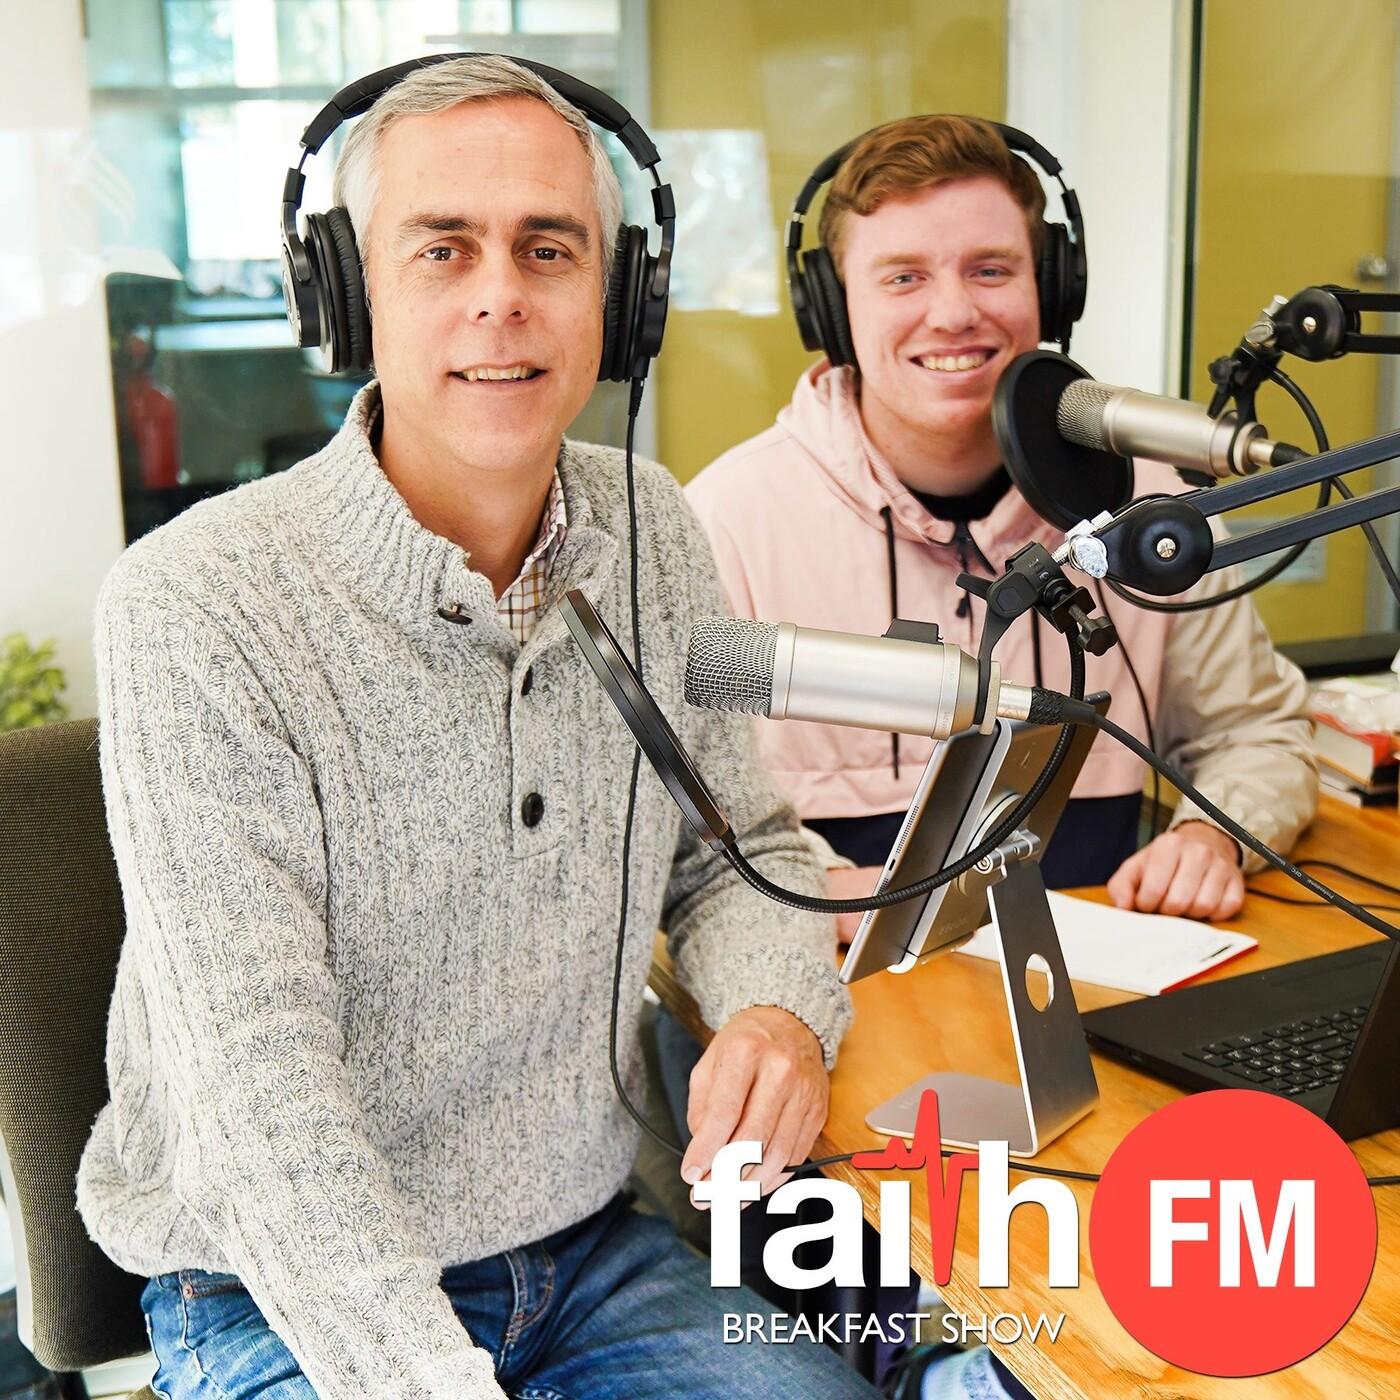 2020-09-25 - Encounter with God - Lyle Southwell & Liam Shuttleworth